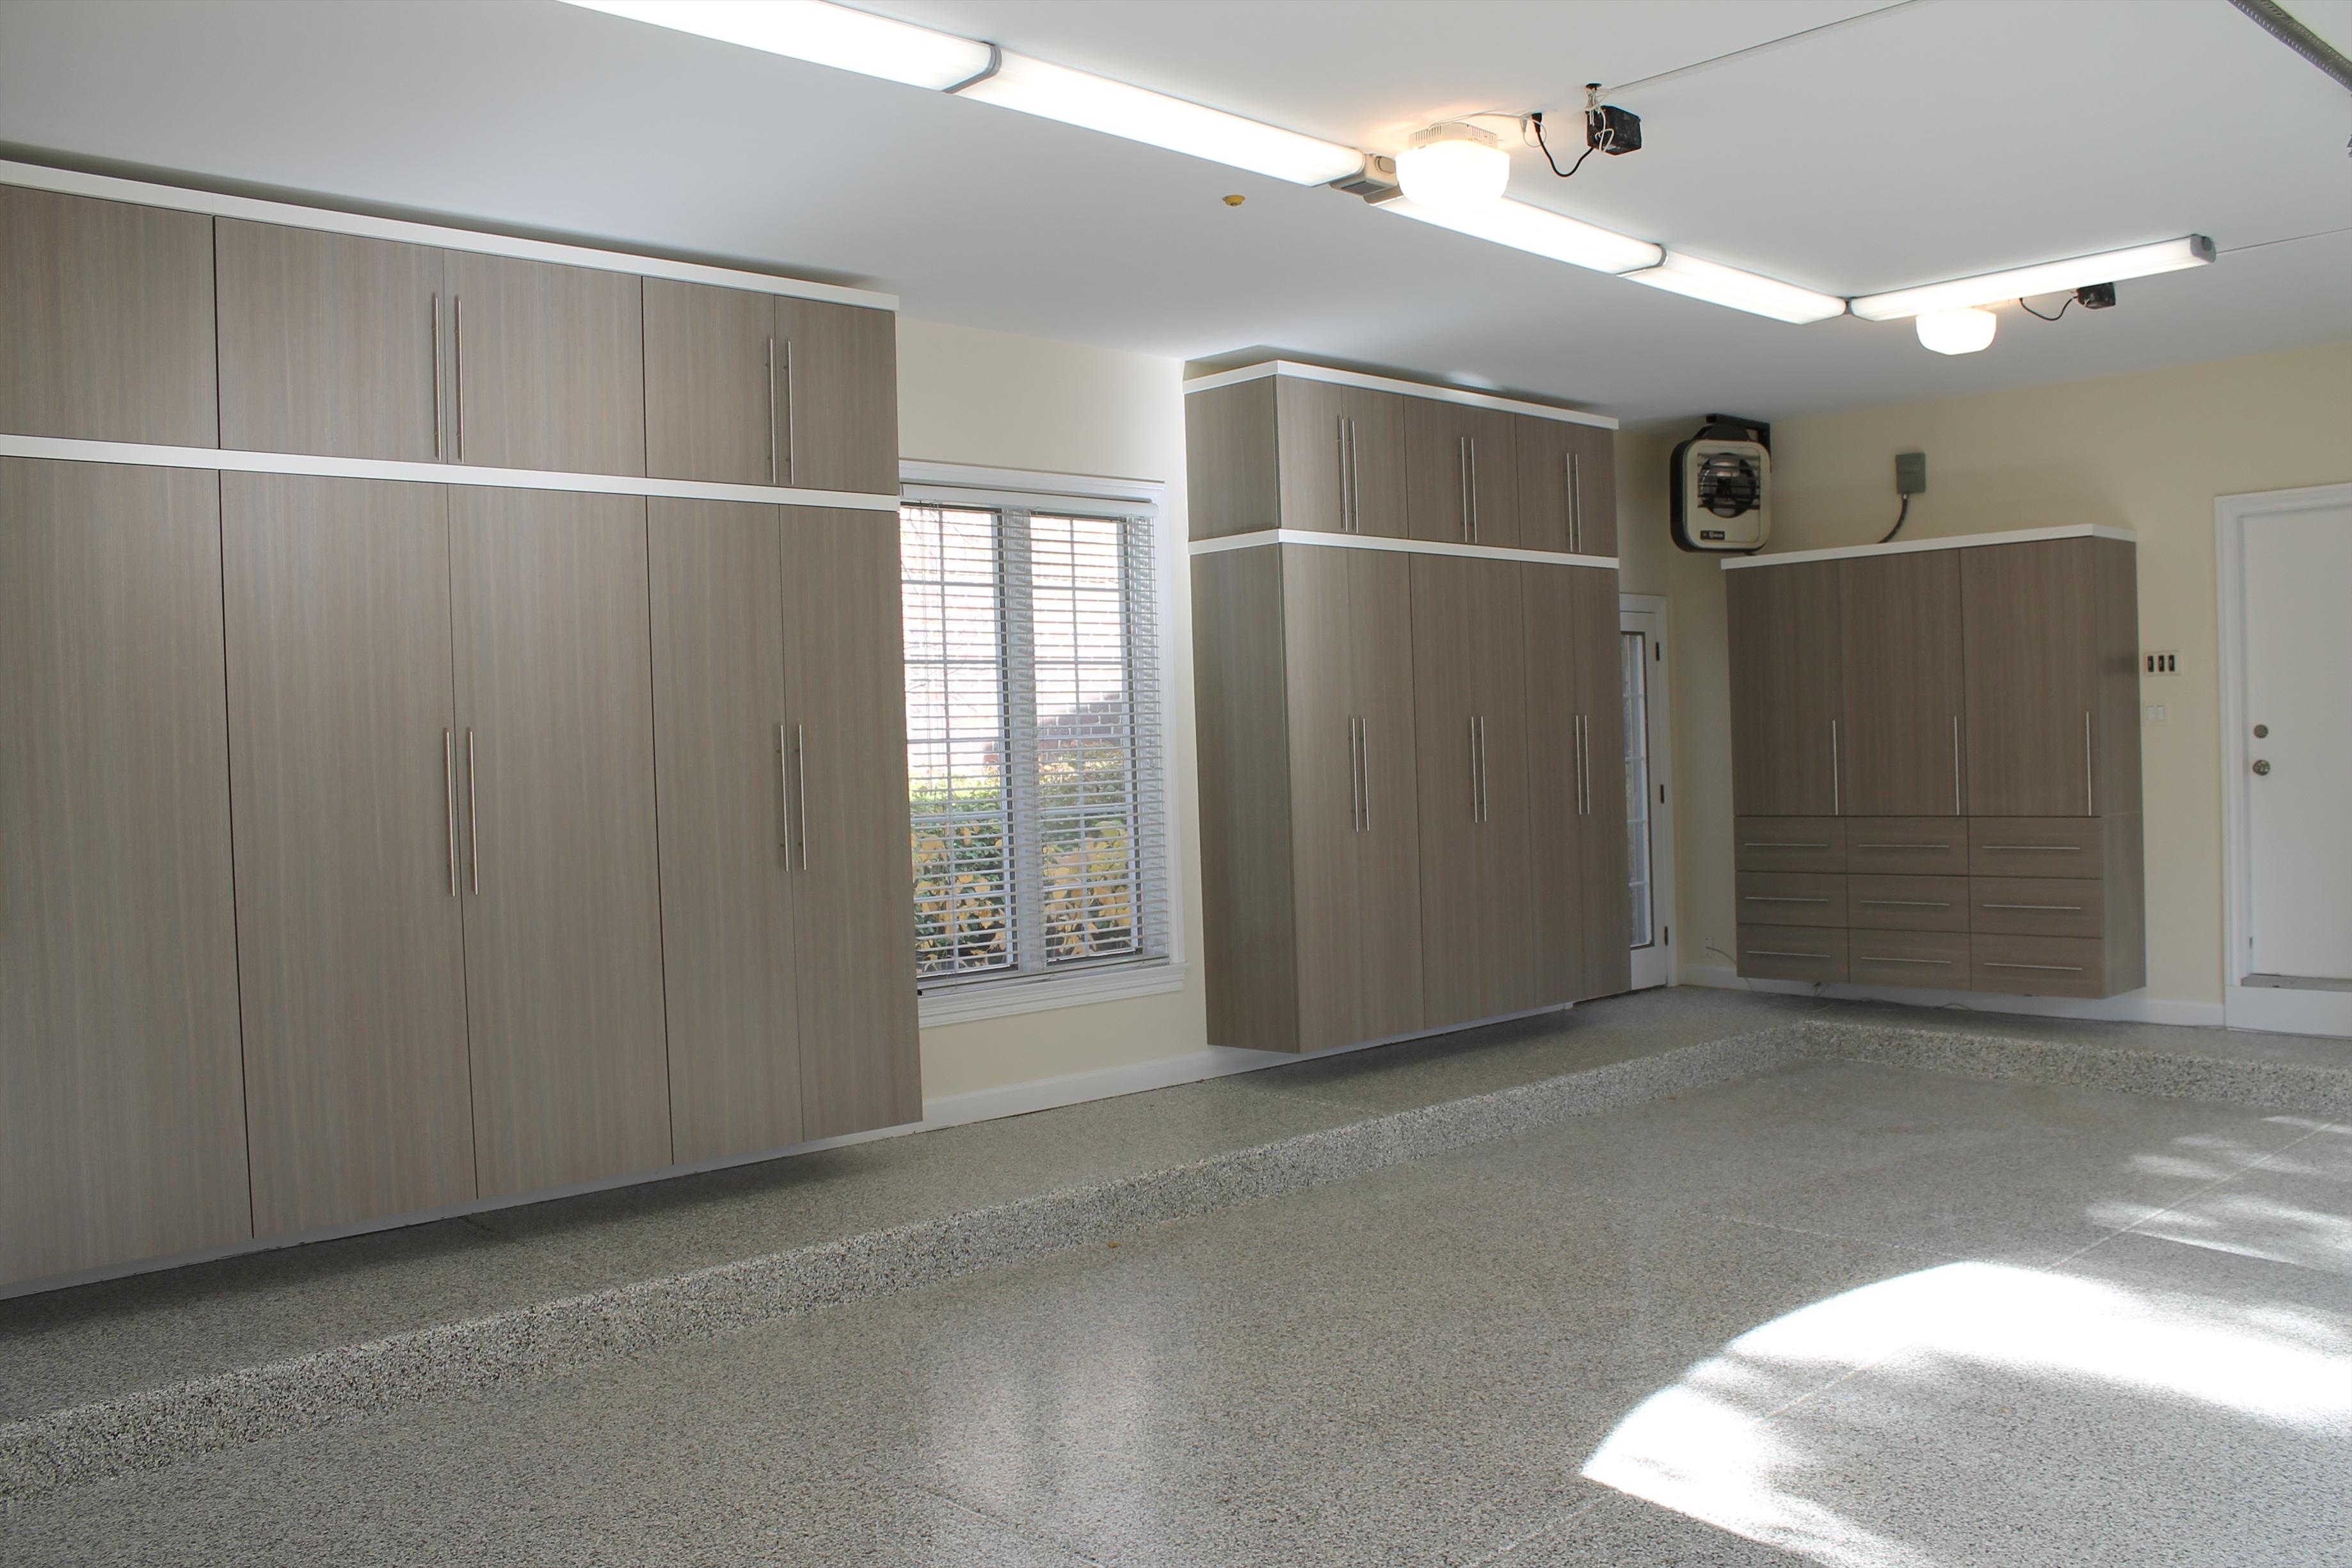 How To Build A Garage Storage Cabinet Home Design Ideas